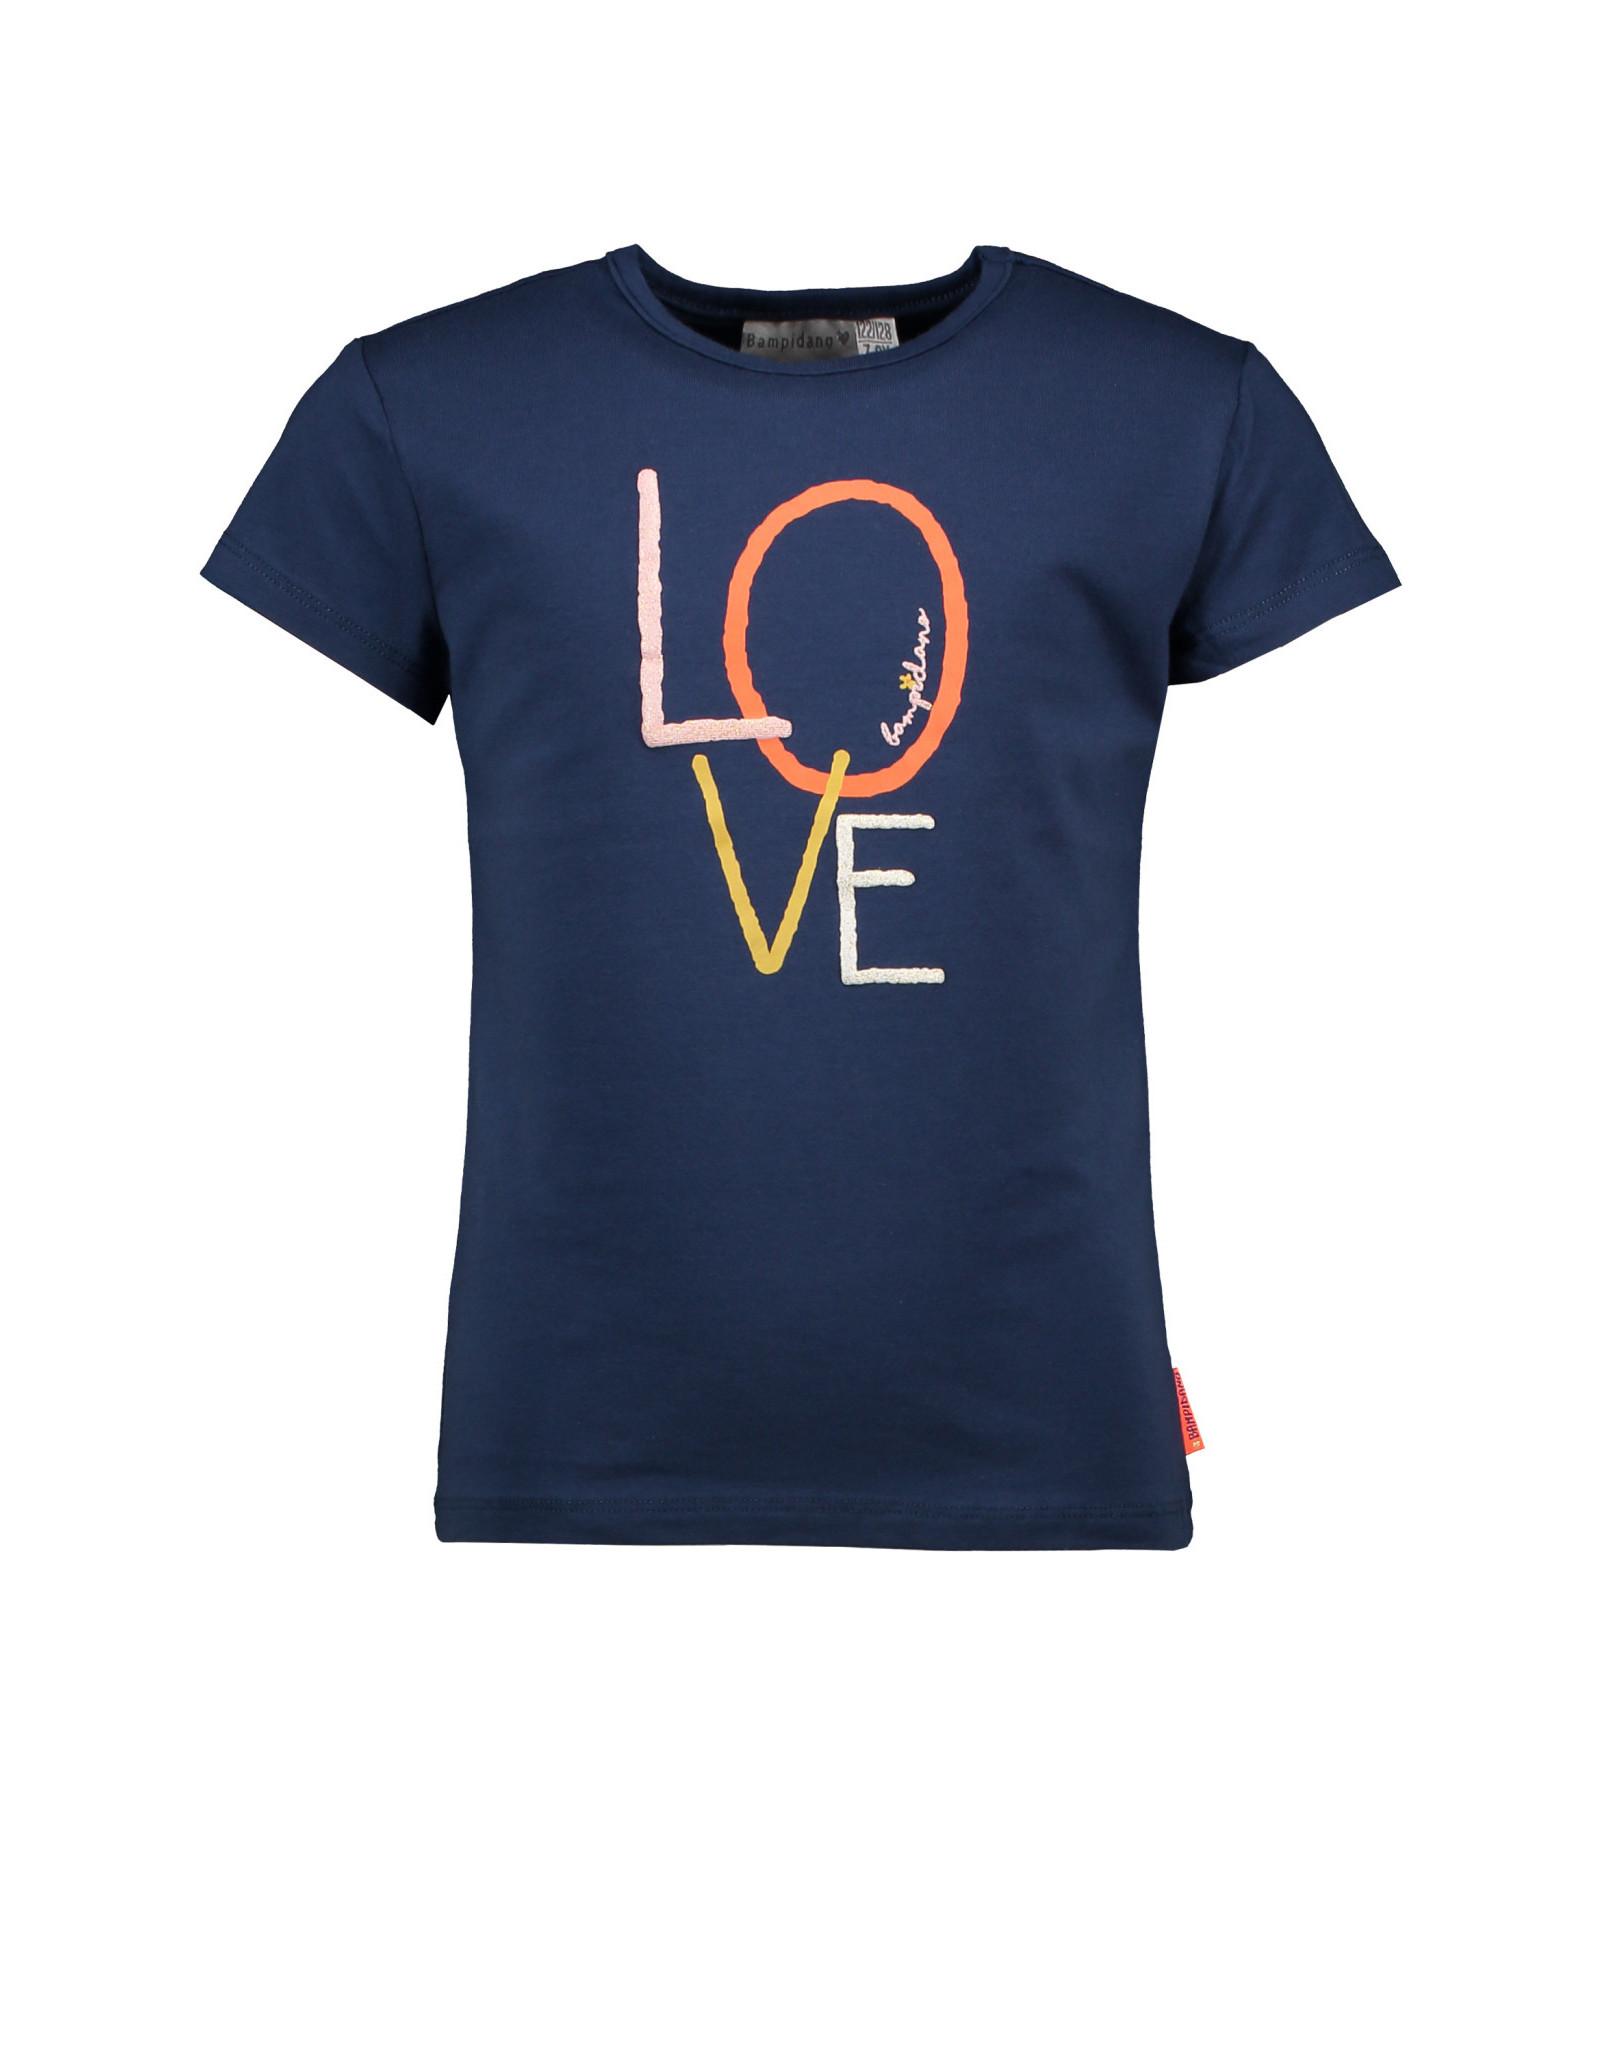 Bampidano Bampidano meisjes t-shirt Dionne Indigo